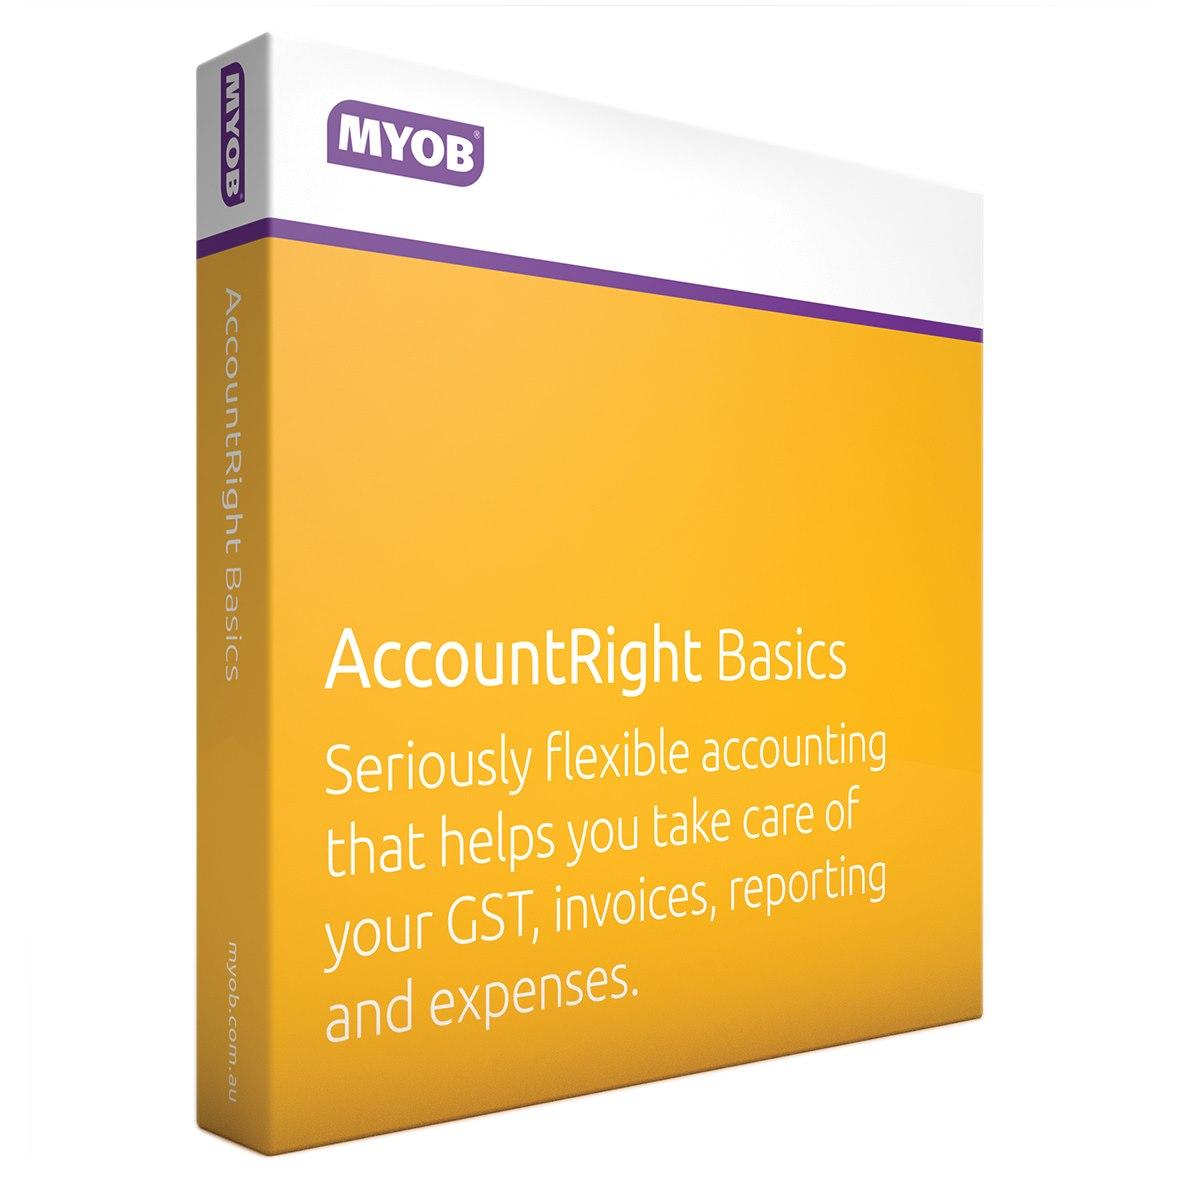 Myob AccountRight Basics